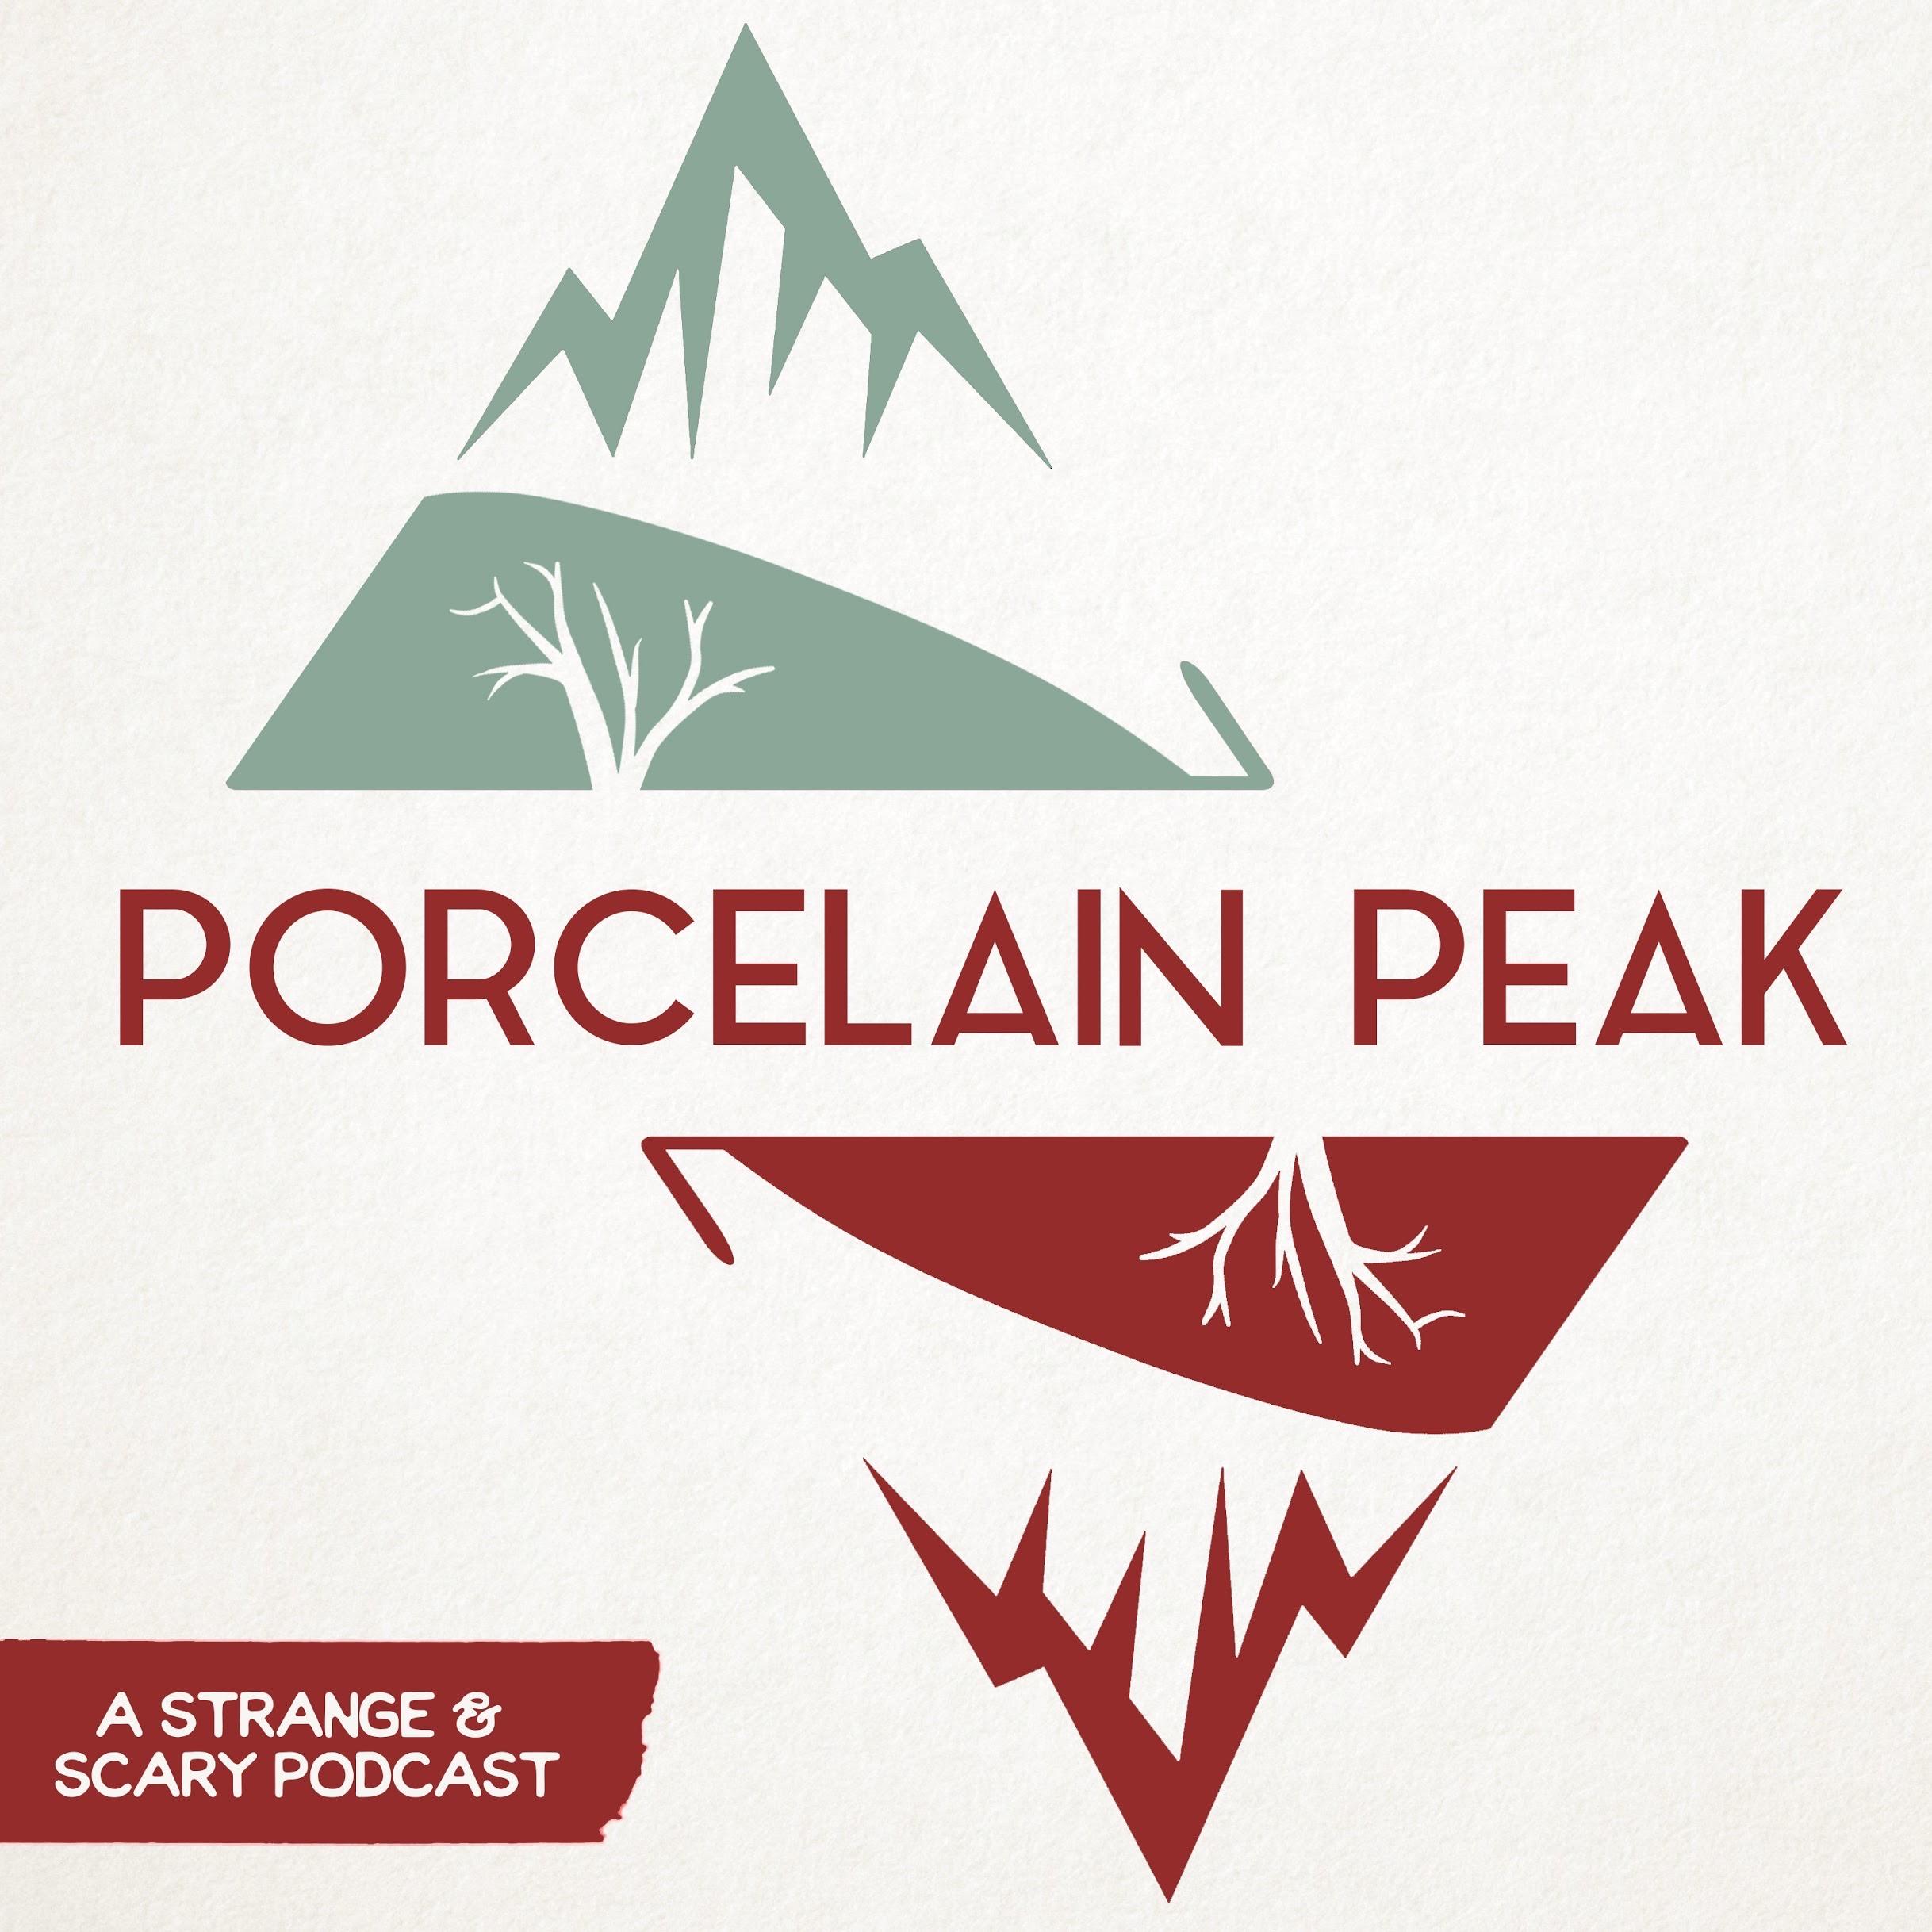 Porcelain Peak-Now Available